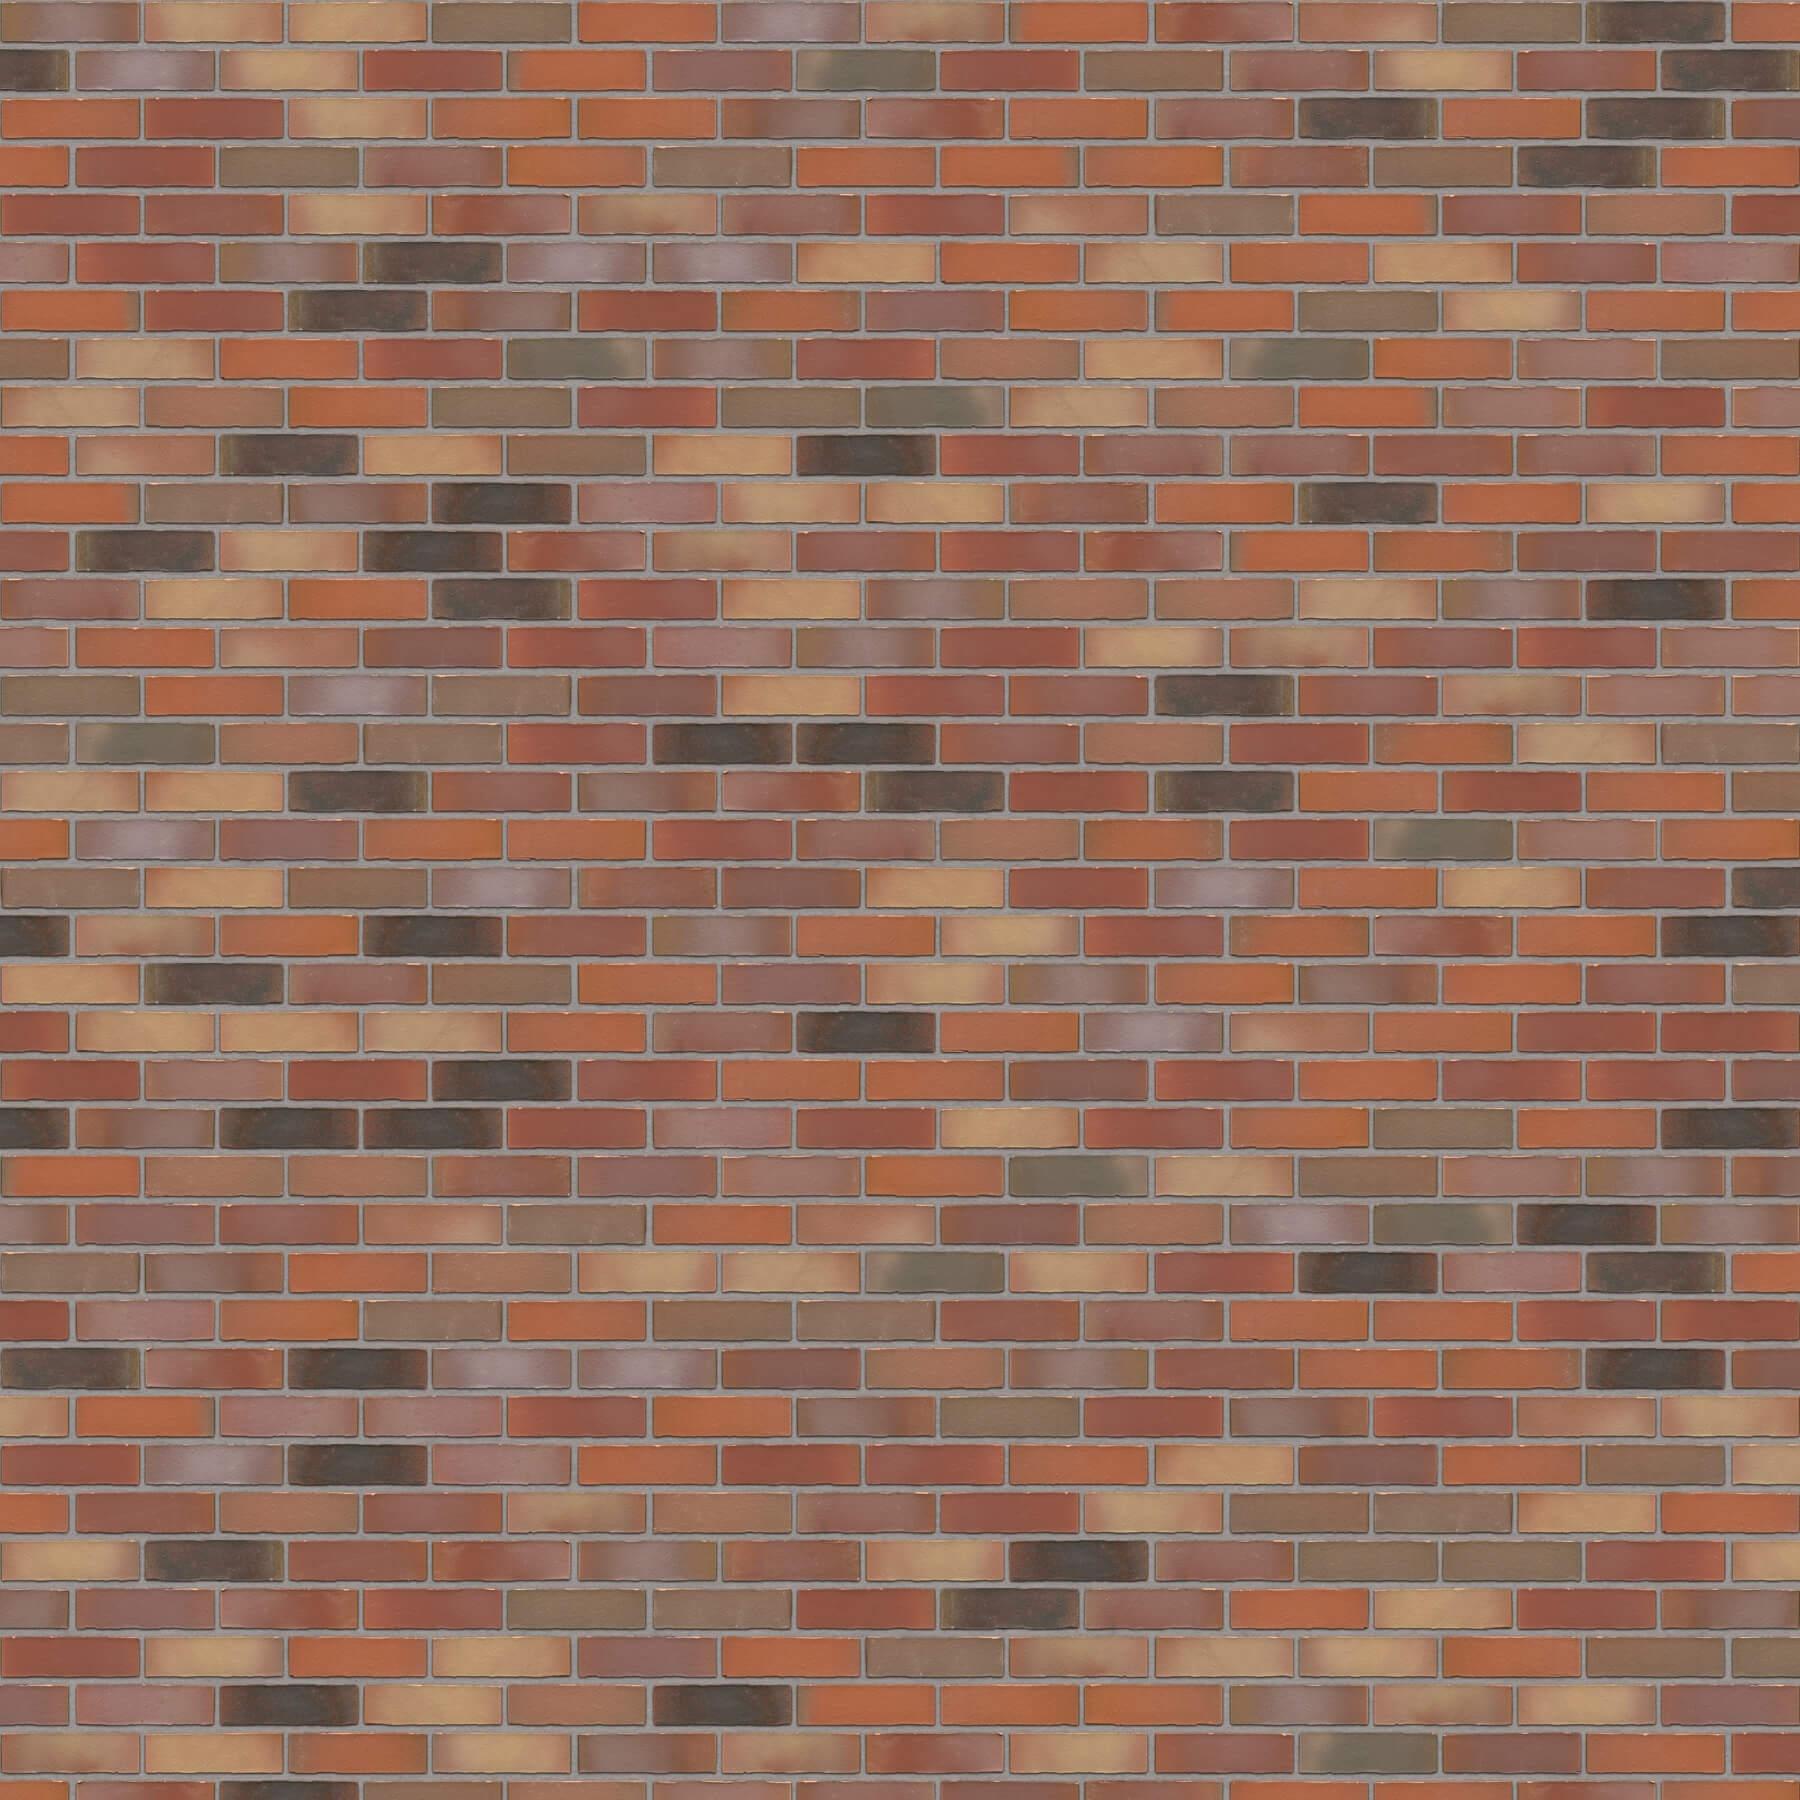 Puna-cigla-FeldHaus-Klinker-brick-house-beograd-nf-k-991-Siva Fuga